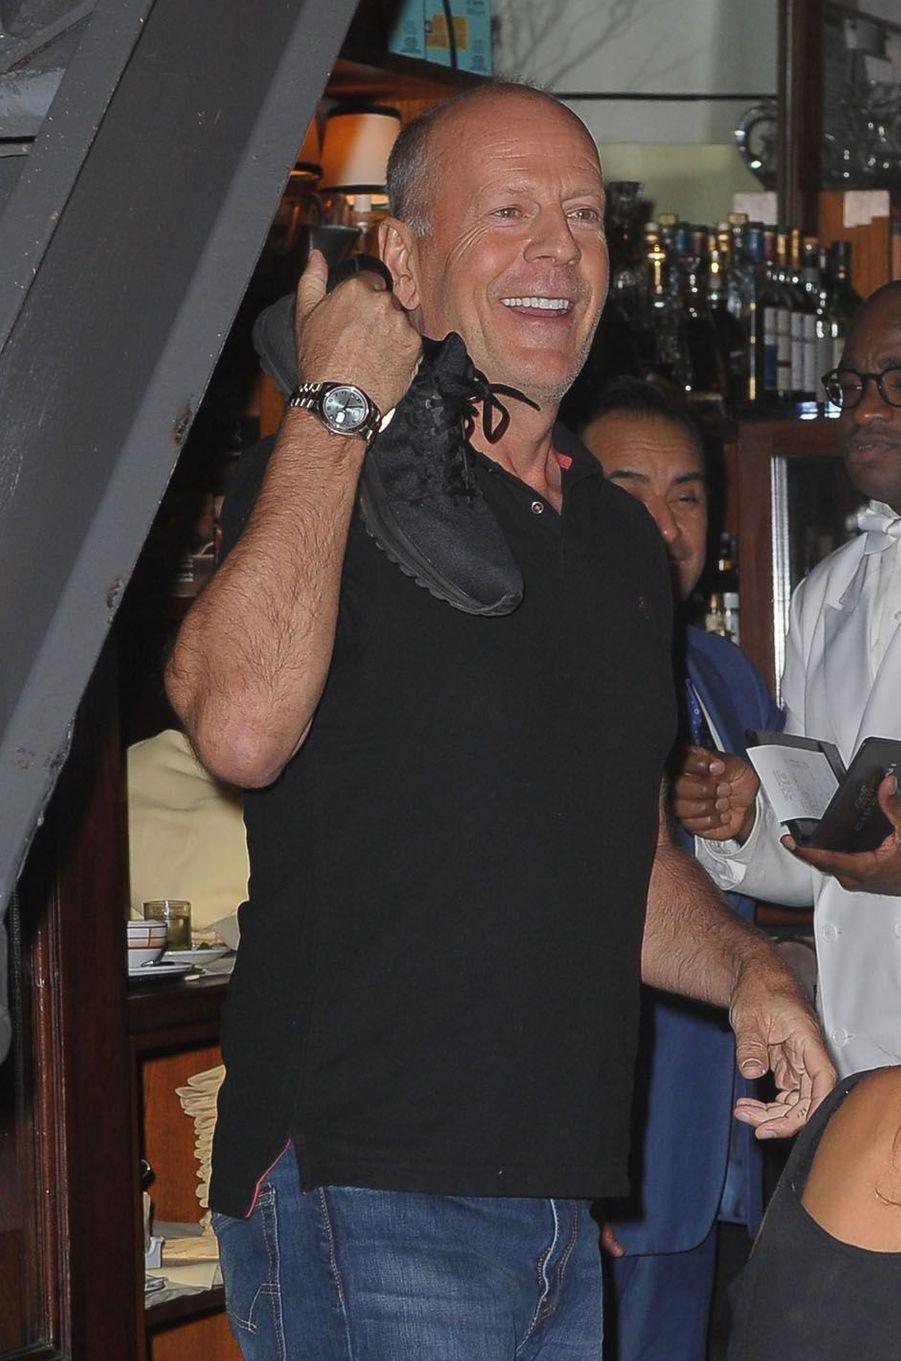 Bruce Willislors de la fête de fiançailles de Quentin Tarantino et Daniella Pick, le 23 septembre 2017 à New York.